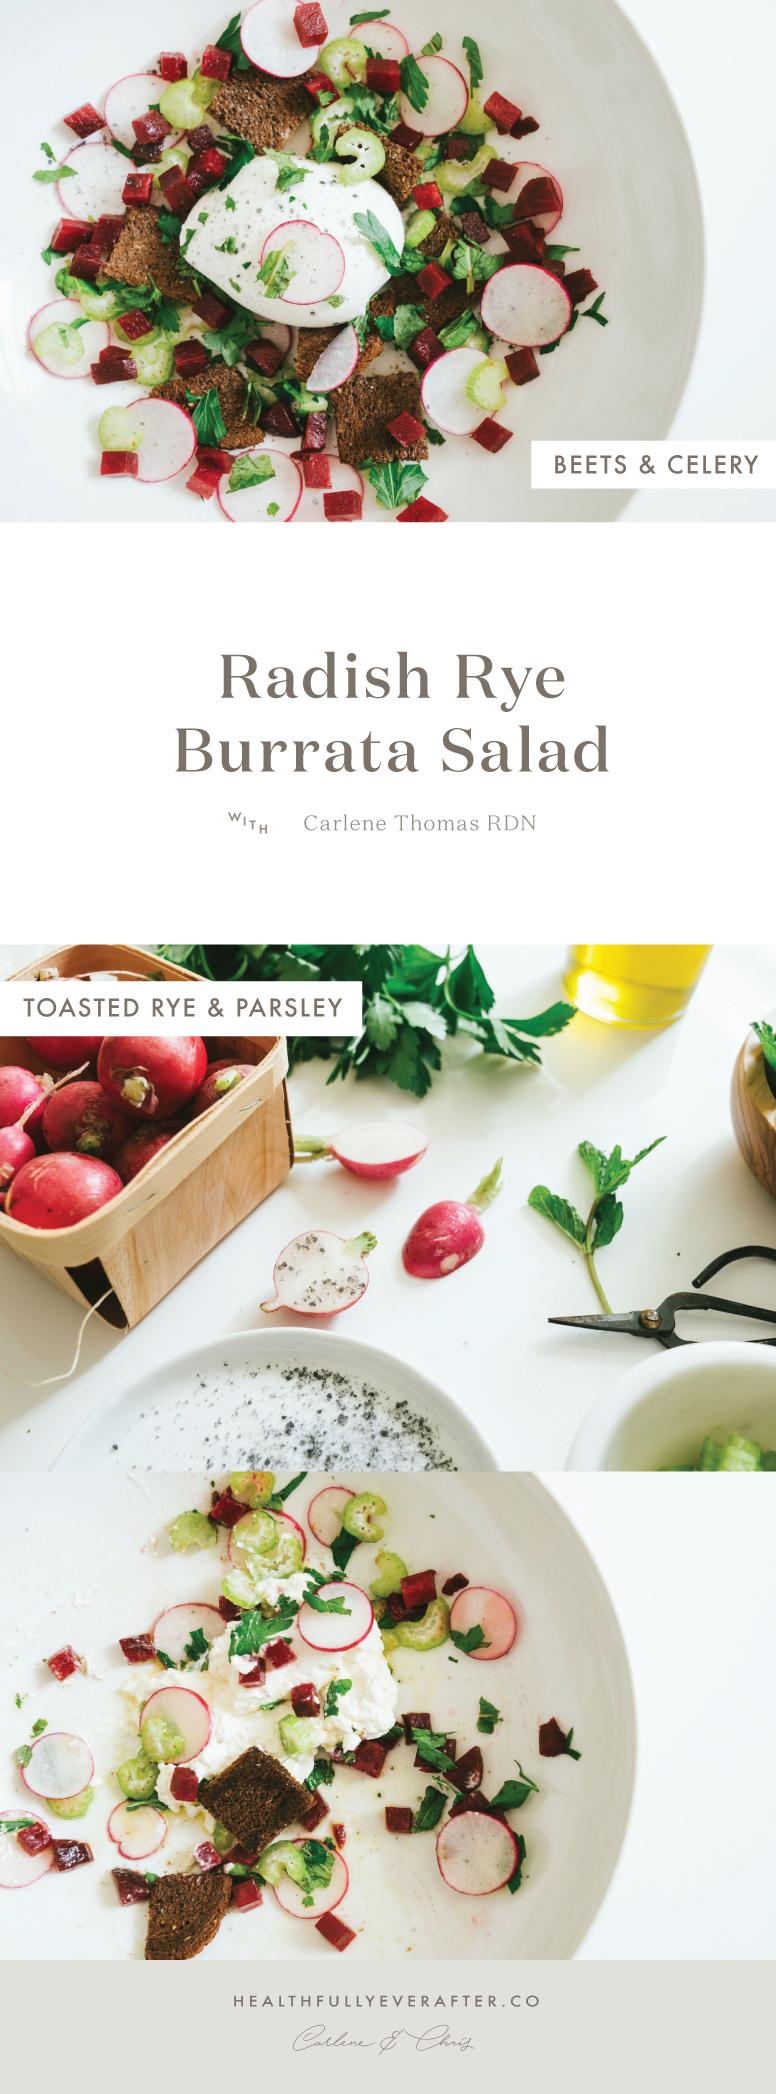 radish and rye burrata salad spring recipe